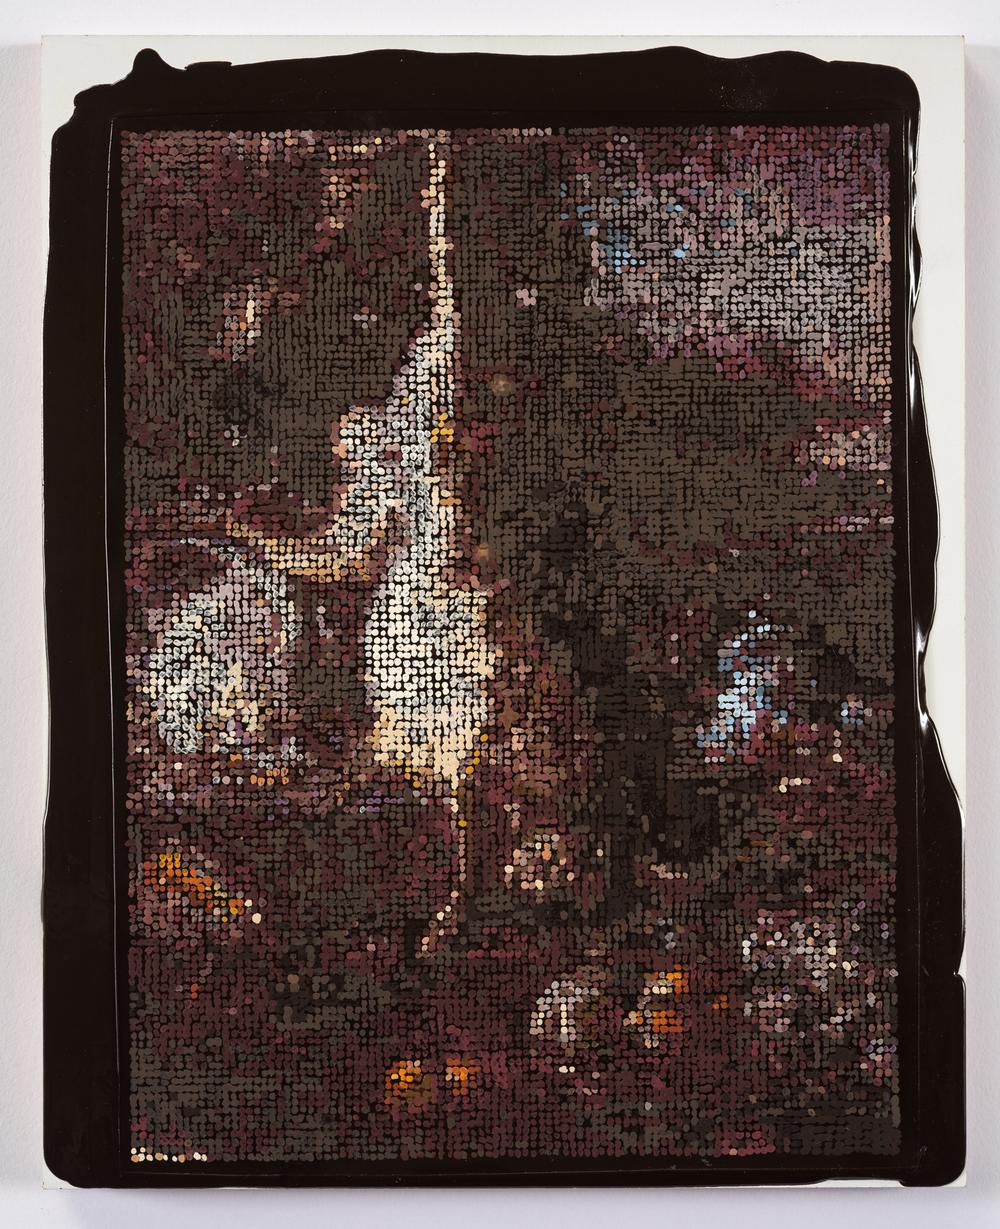 Kirstin Lamb After Weenix 2015 Gouache on Duralar with Acrylic on Panel 8 x 10in.jpg